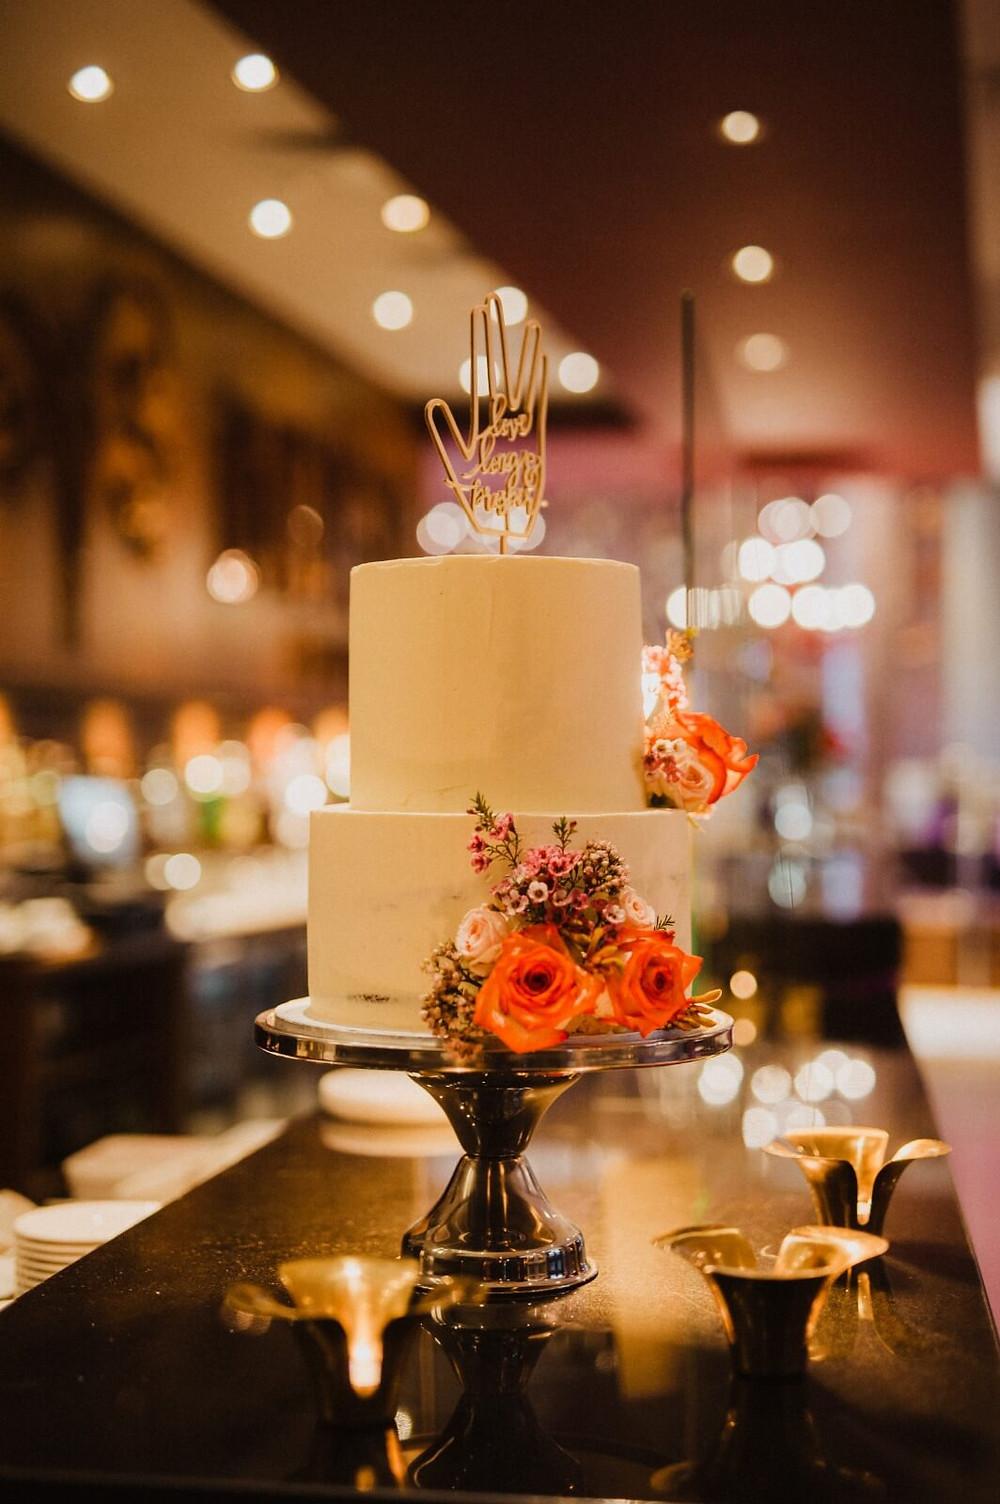 Vulcan Cake Topper on a Wedding Cake